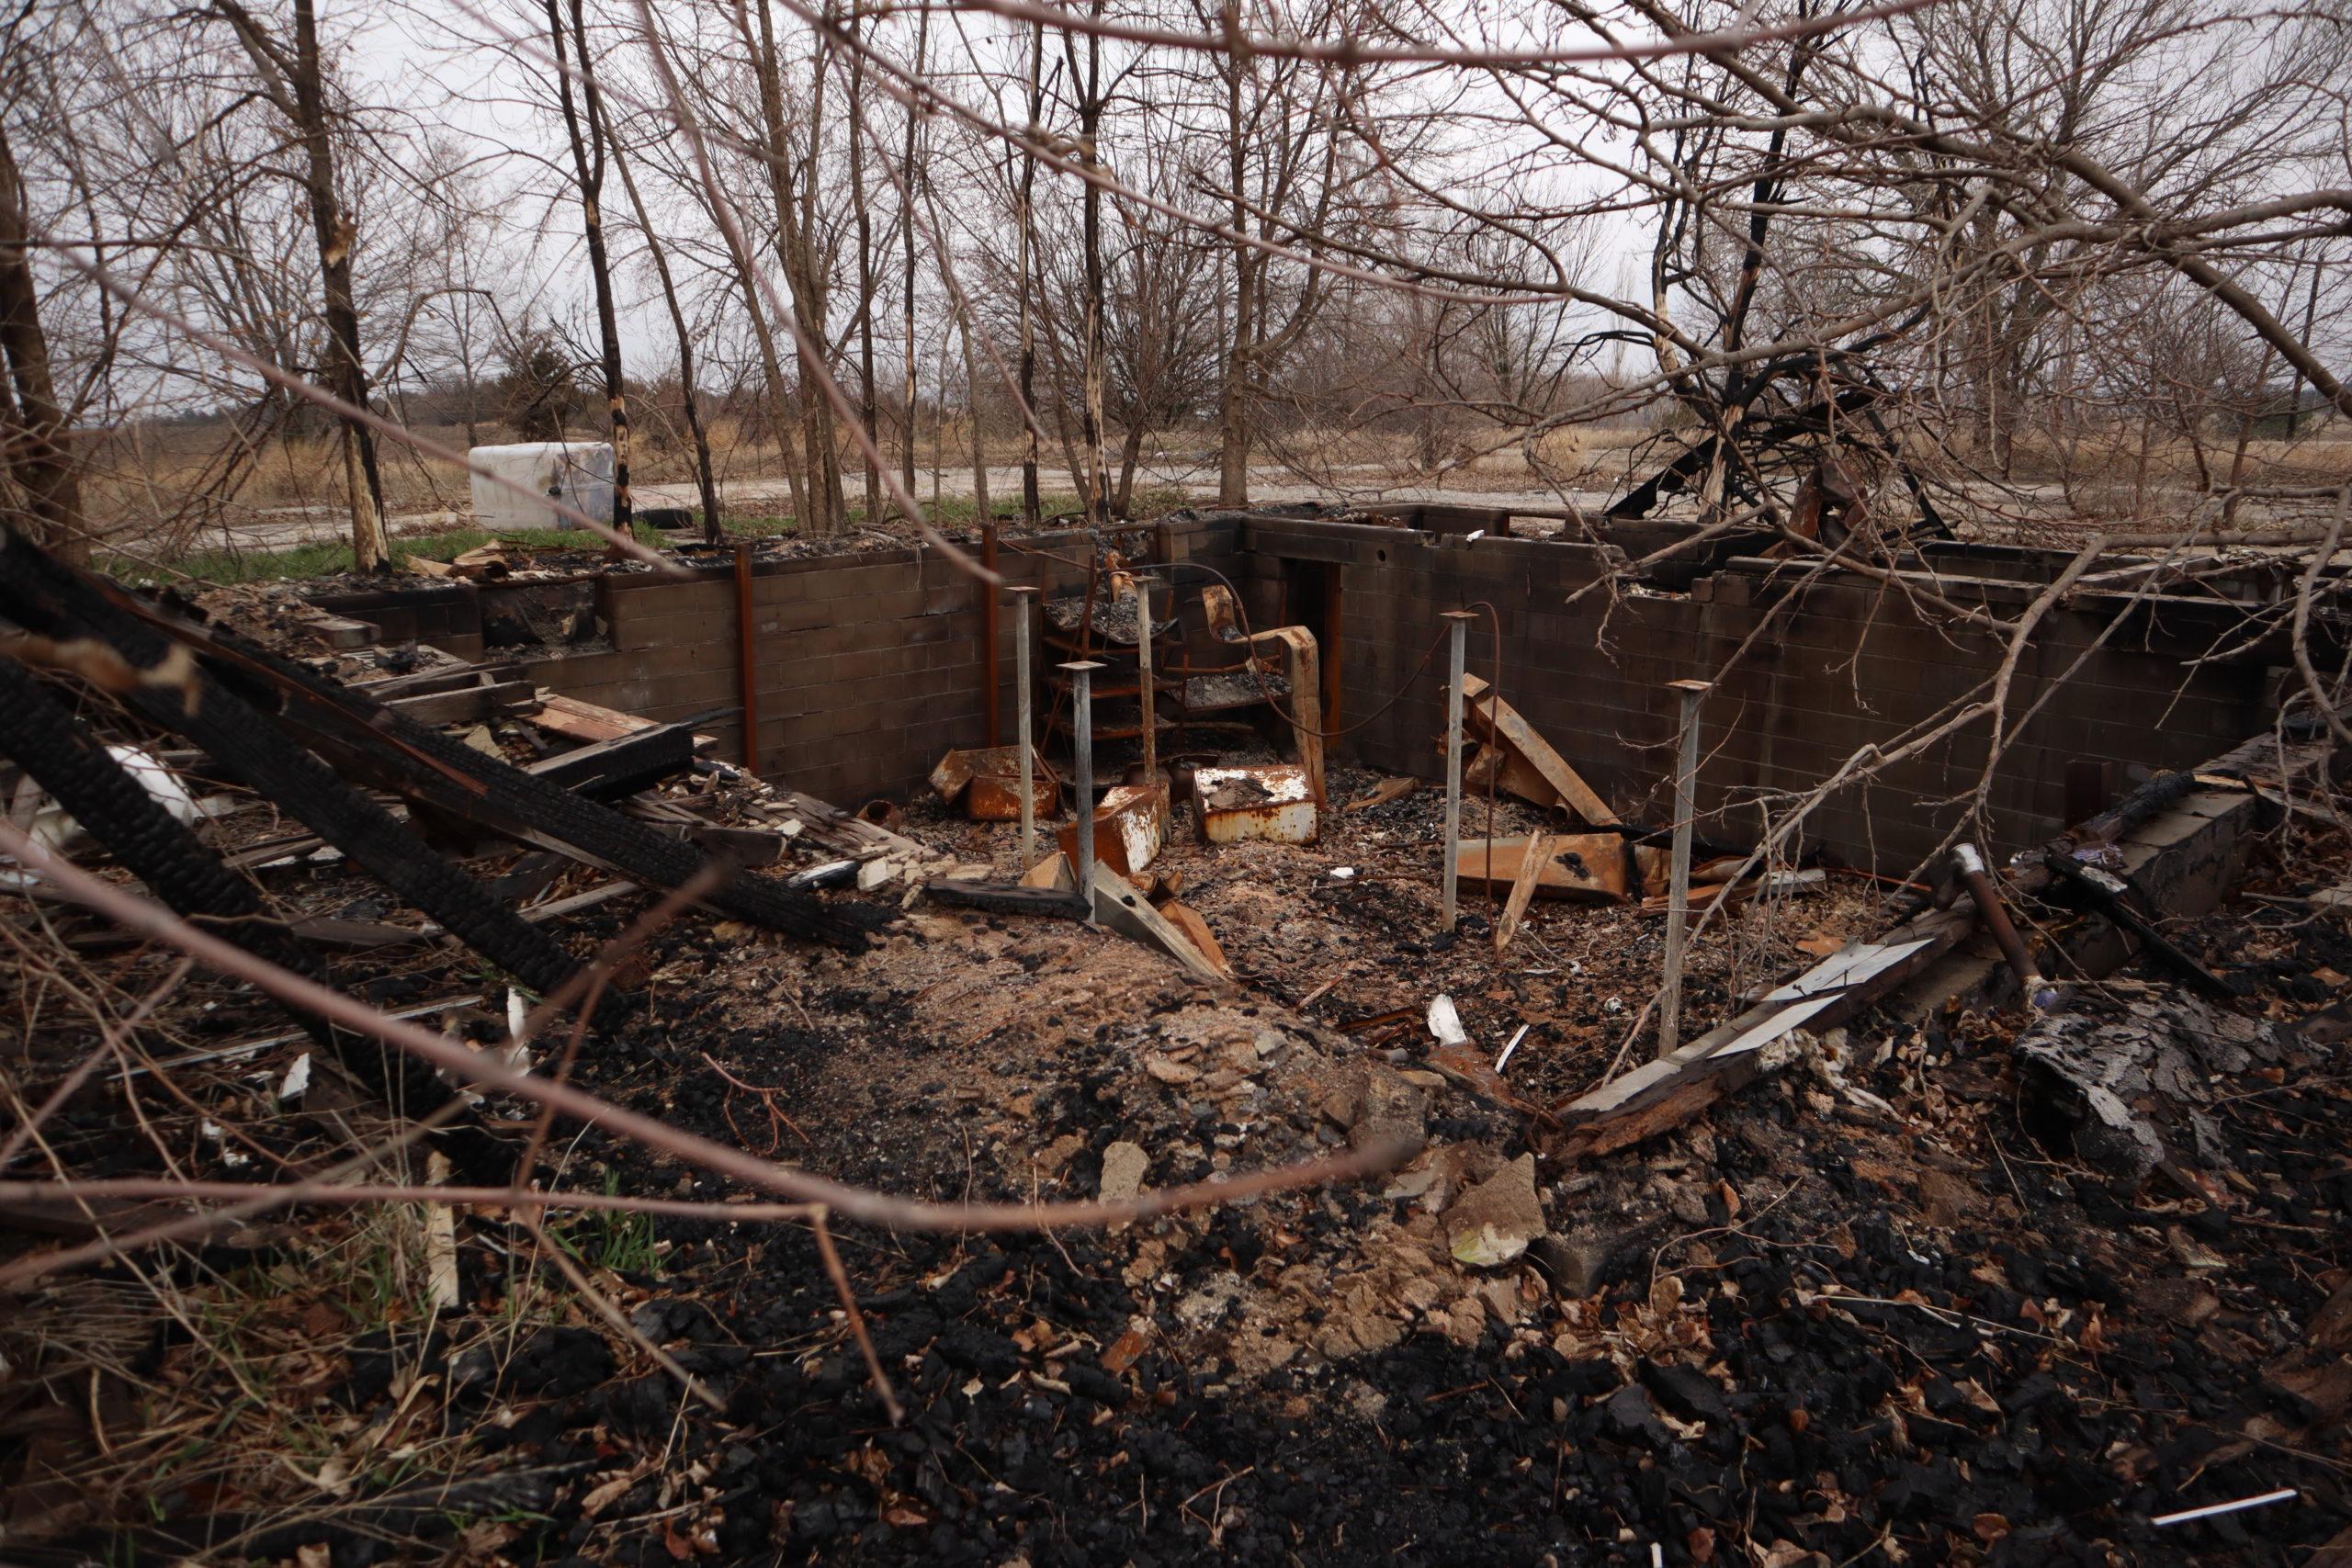 burntfoundation scaled - Prairie Peace Park now lies in pieces